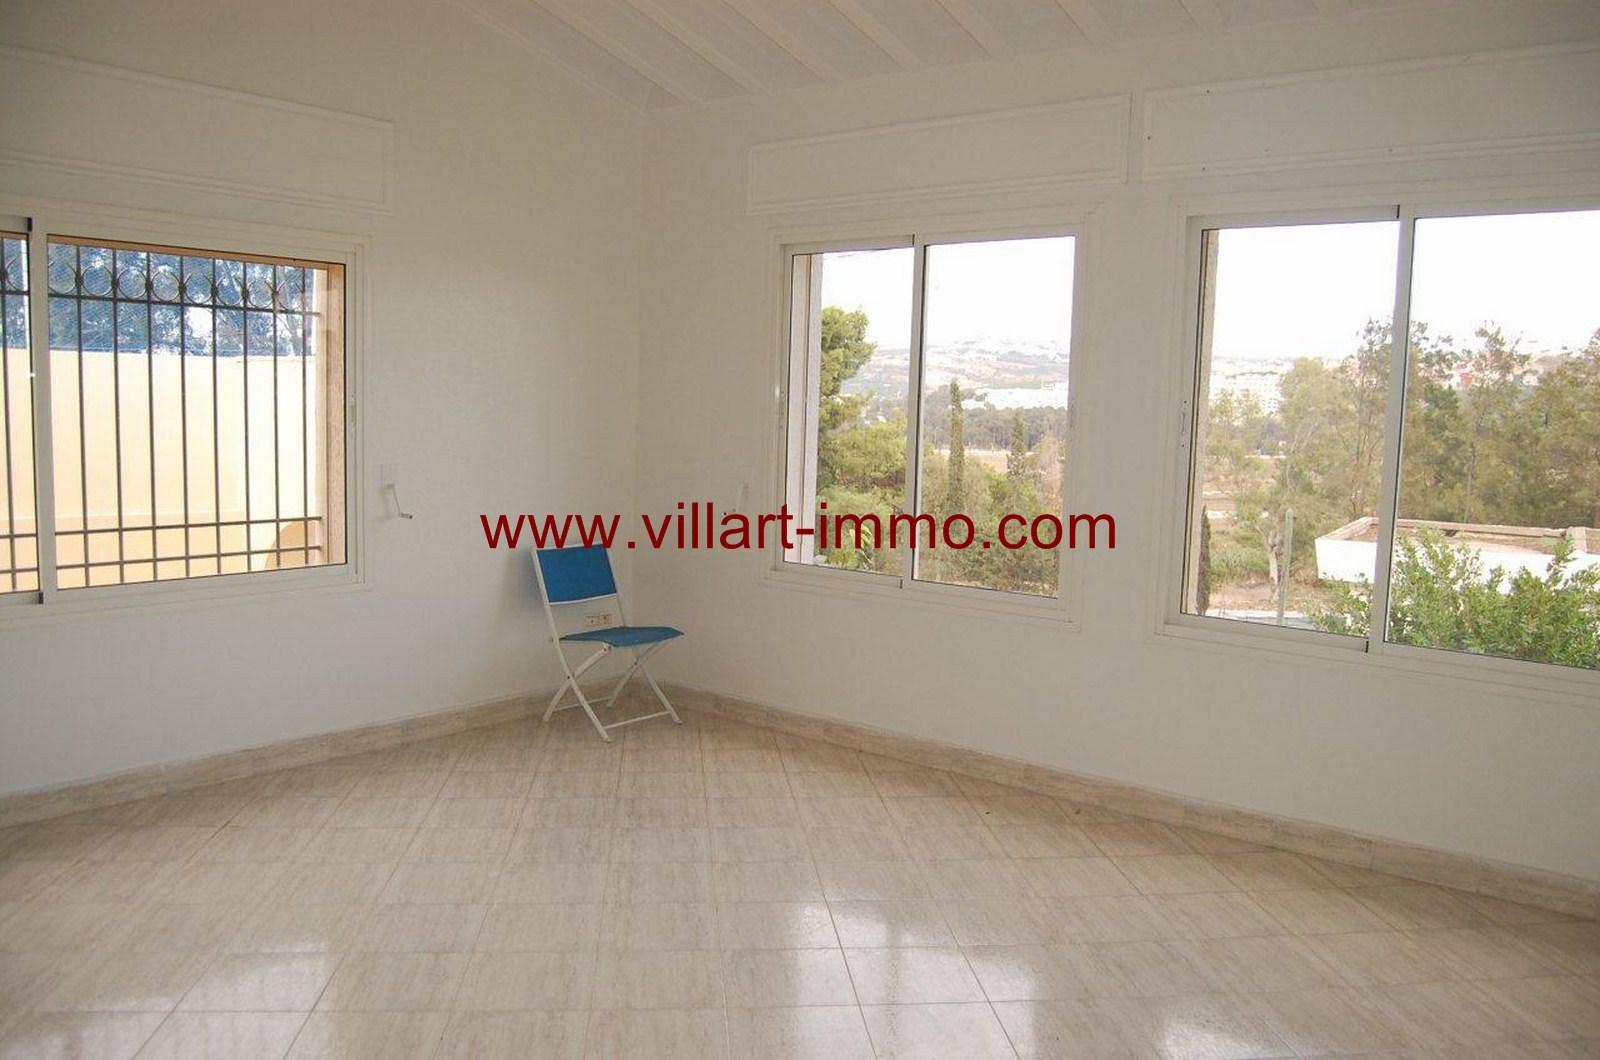 8-location-villa-non-meublee-malabata-tanger-chambre-1-lv902-villart-immo